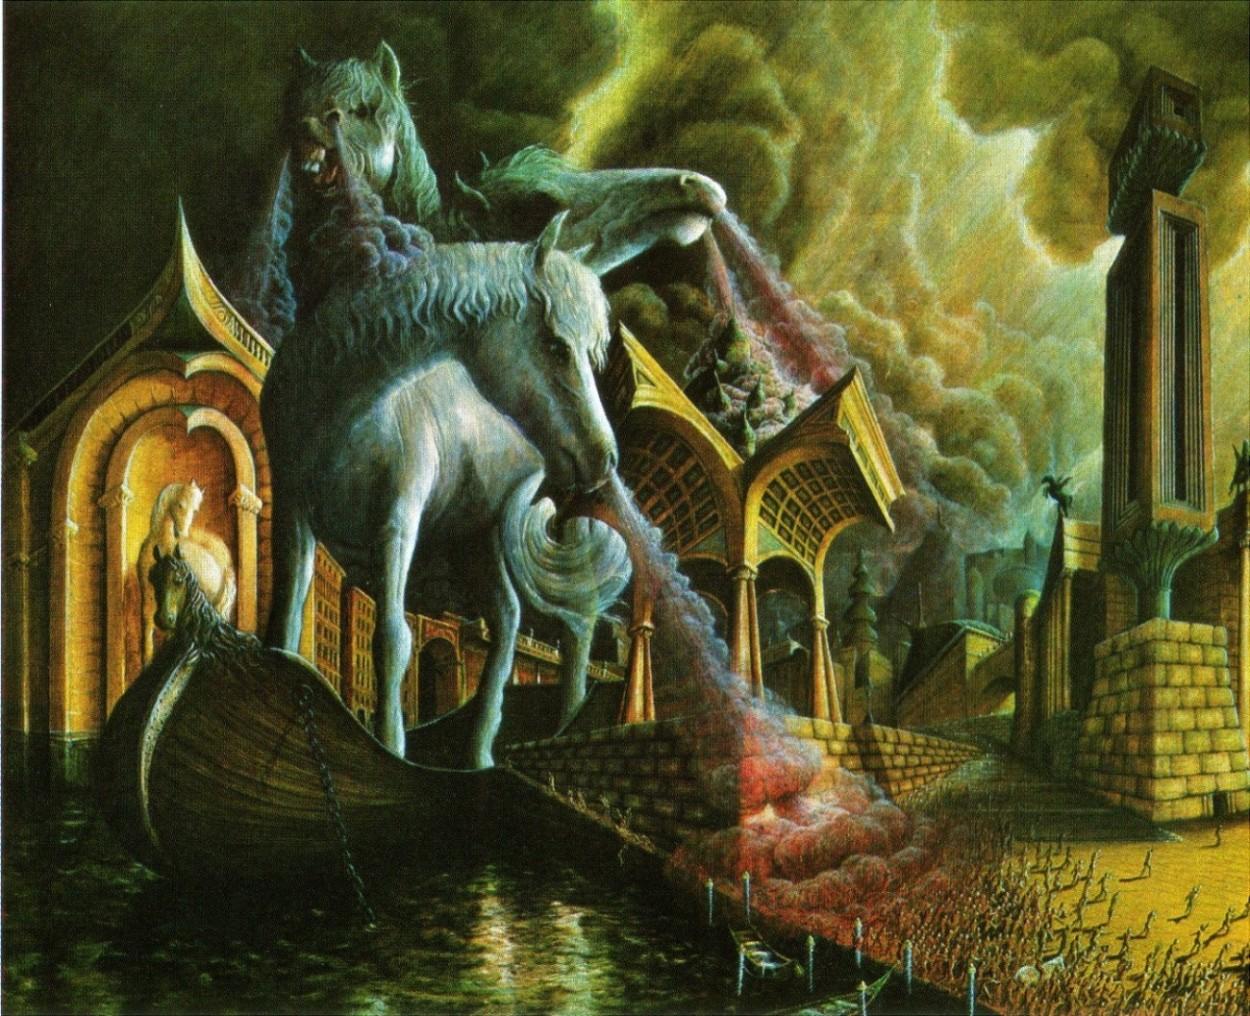 Trojanisches Pferd ttip ceta tisa monsanto